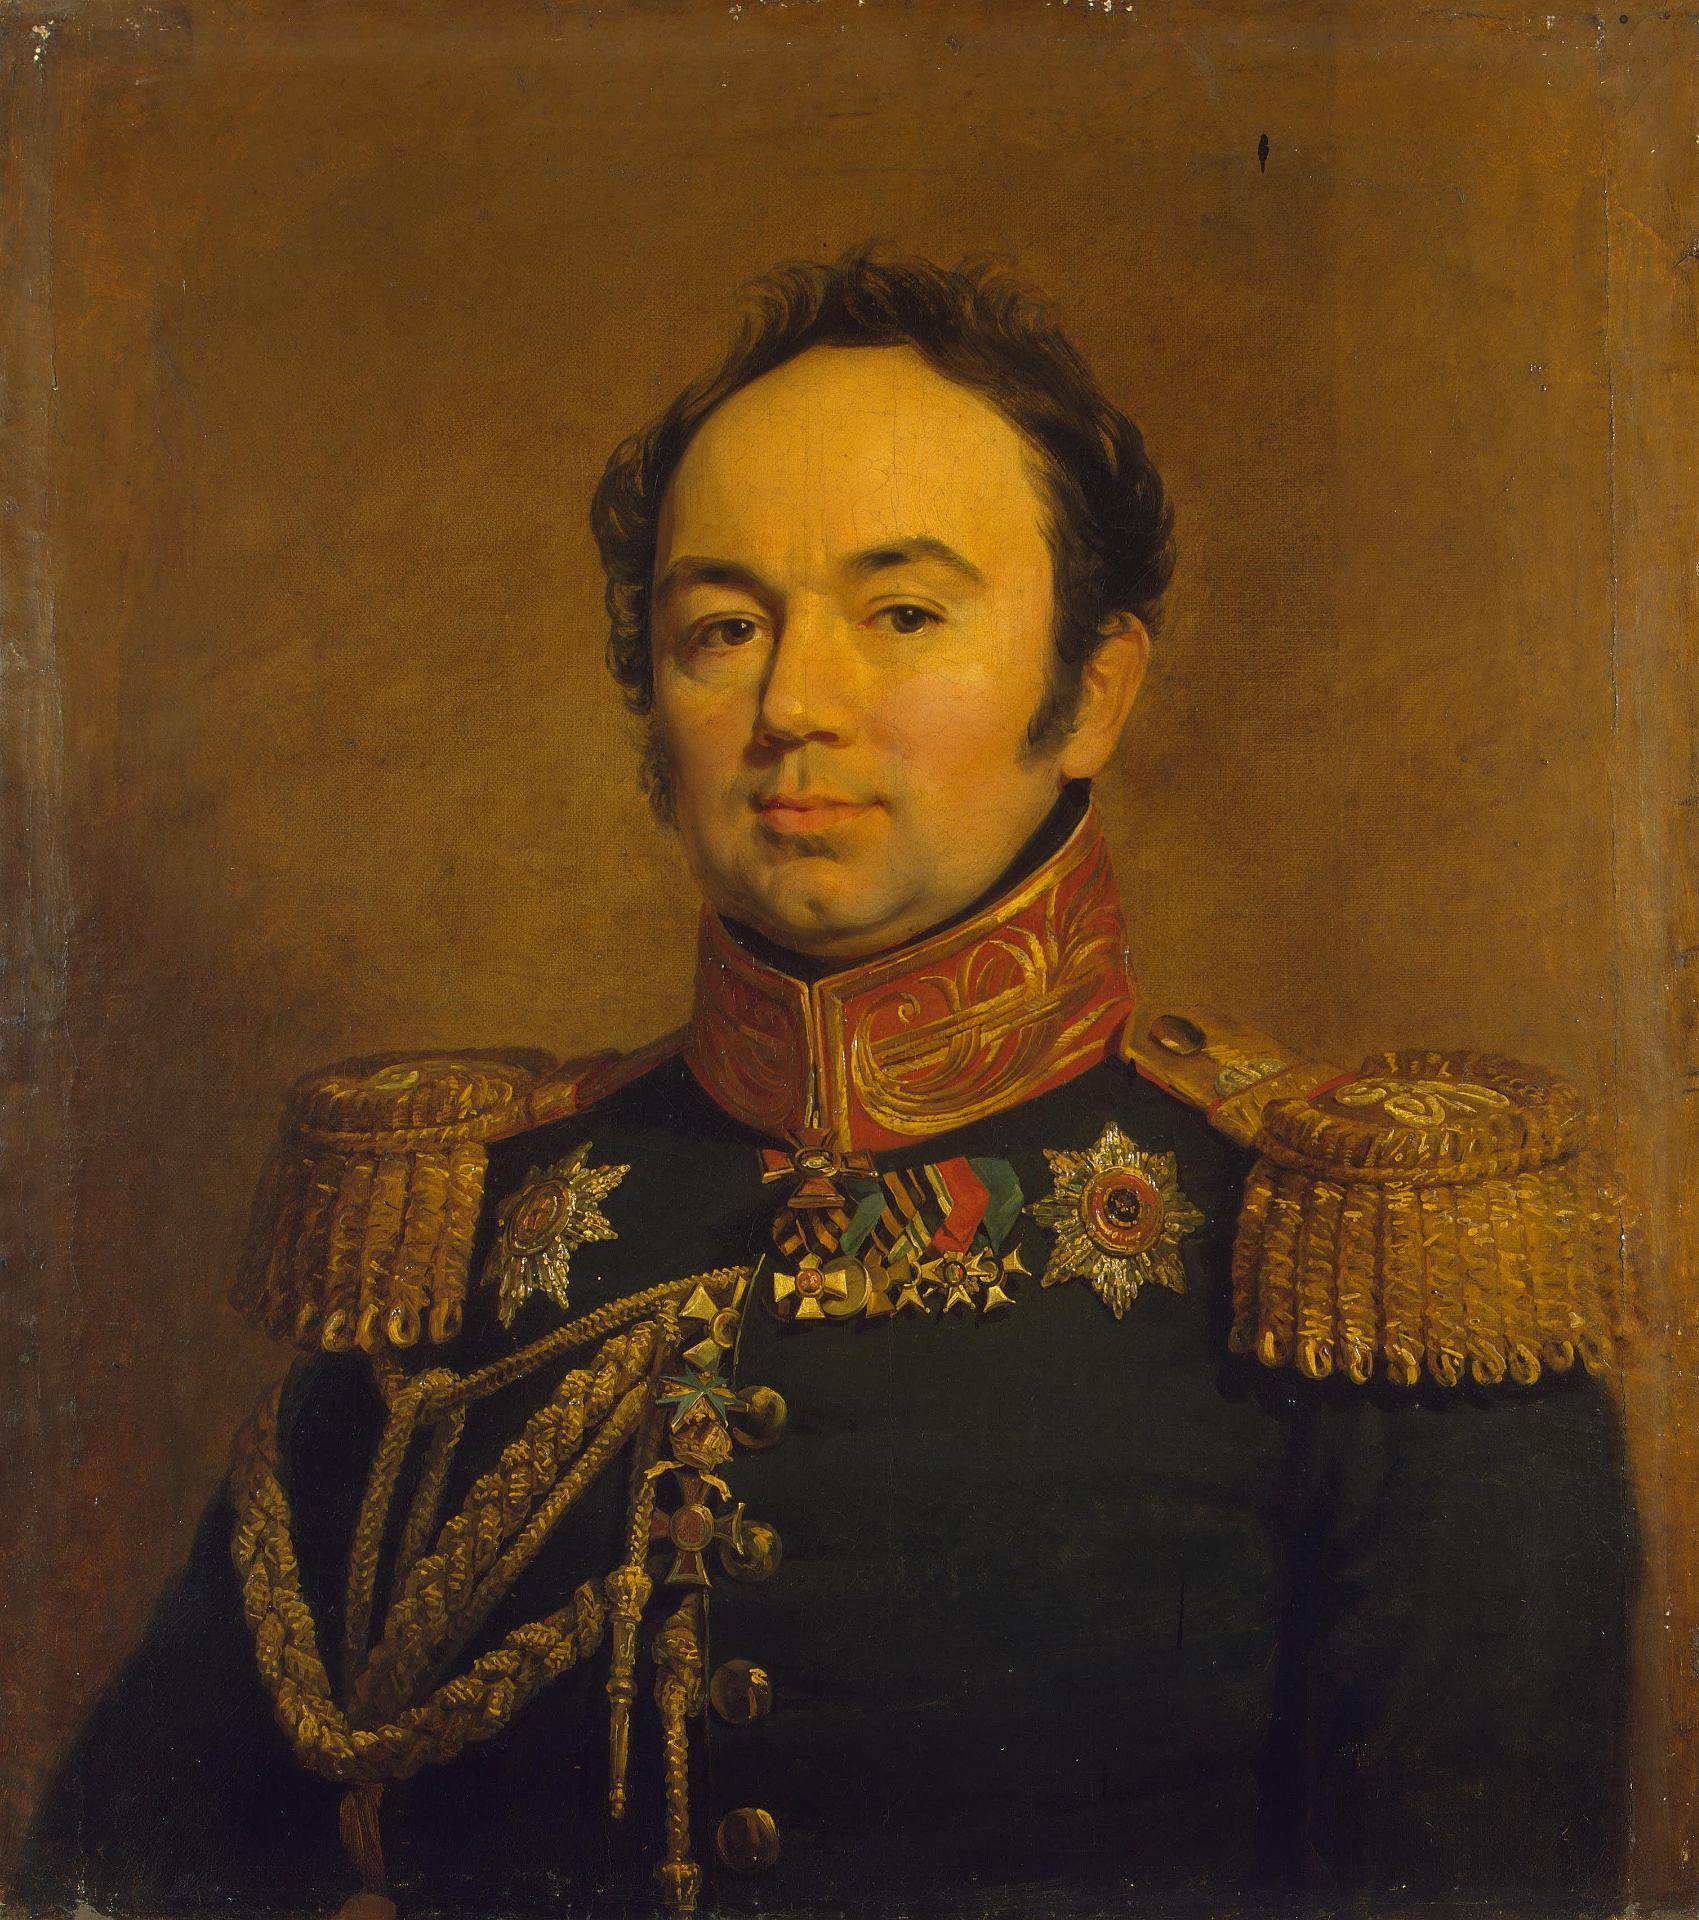 http://upload.wikimedia.org/wikipedia/commons/9/96/Zakrevskiy_Arseniy_Andreevich.jpg?uselang=ru